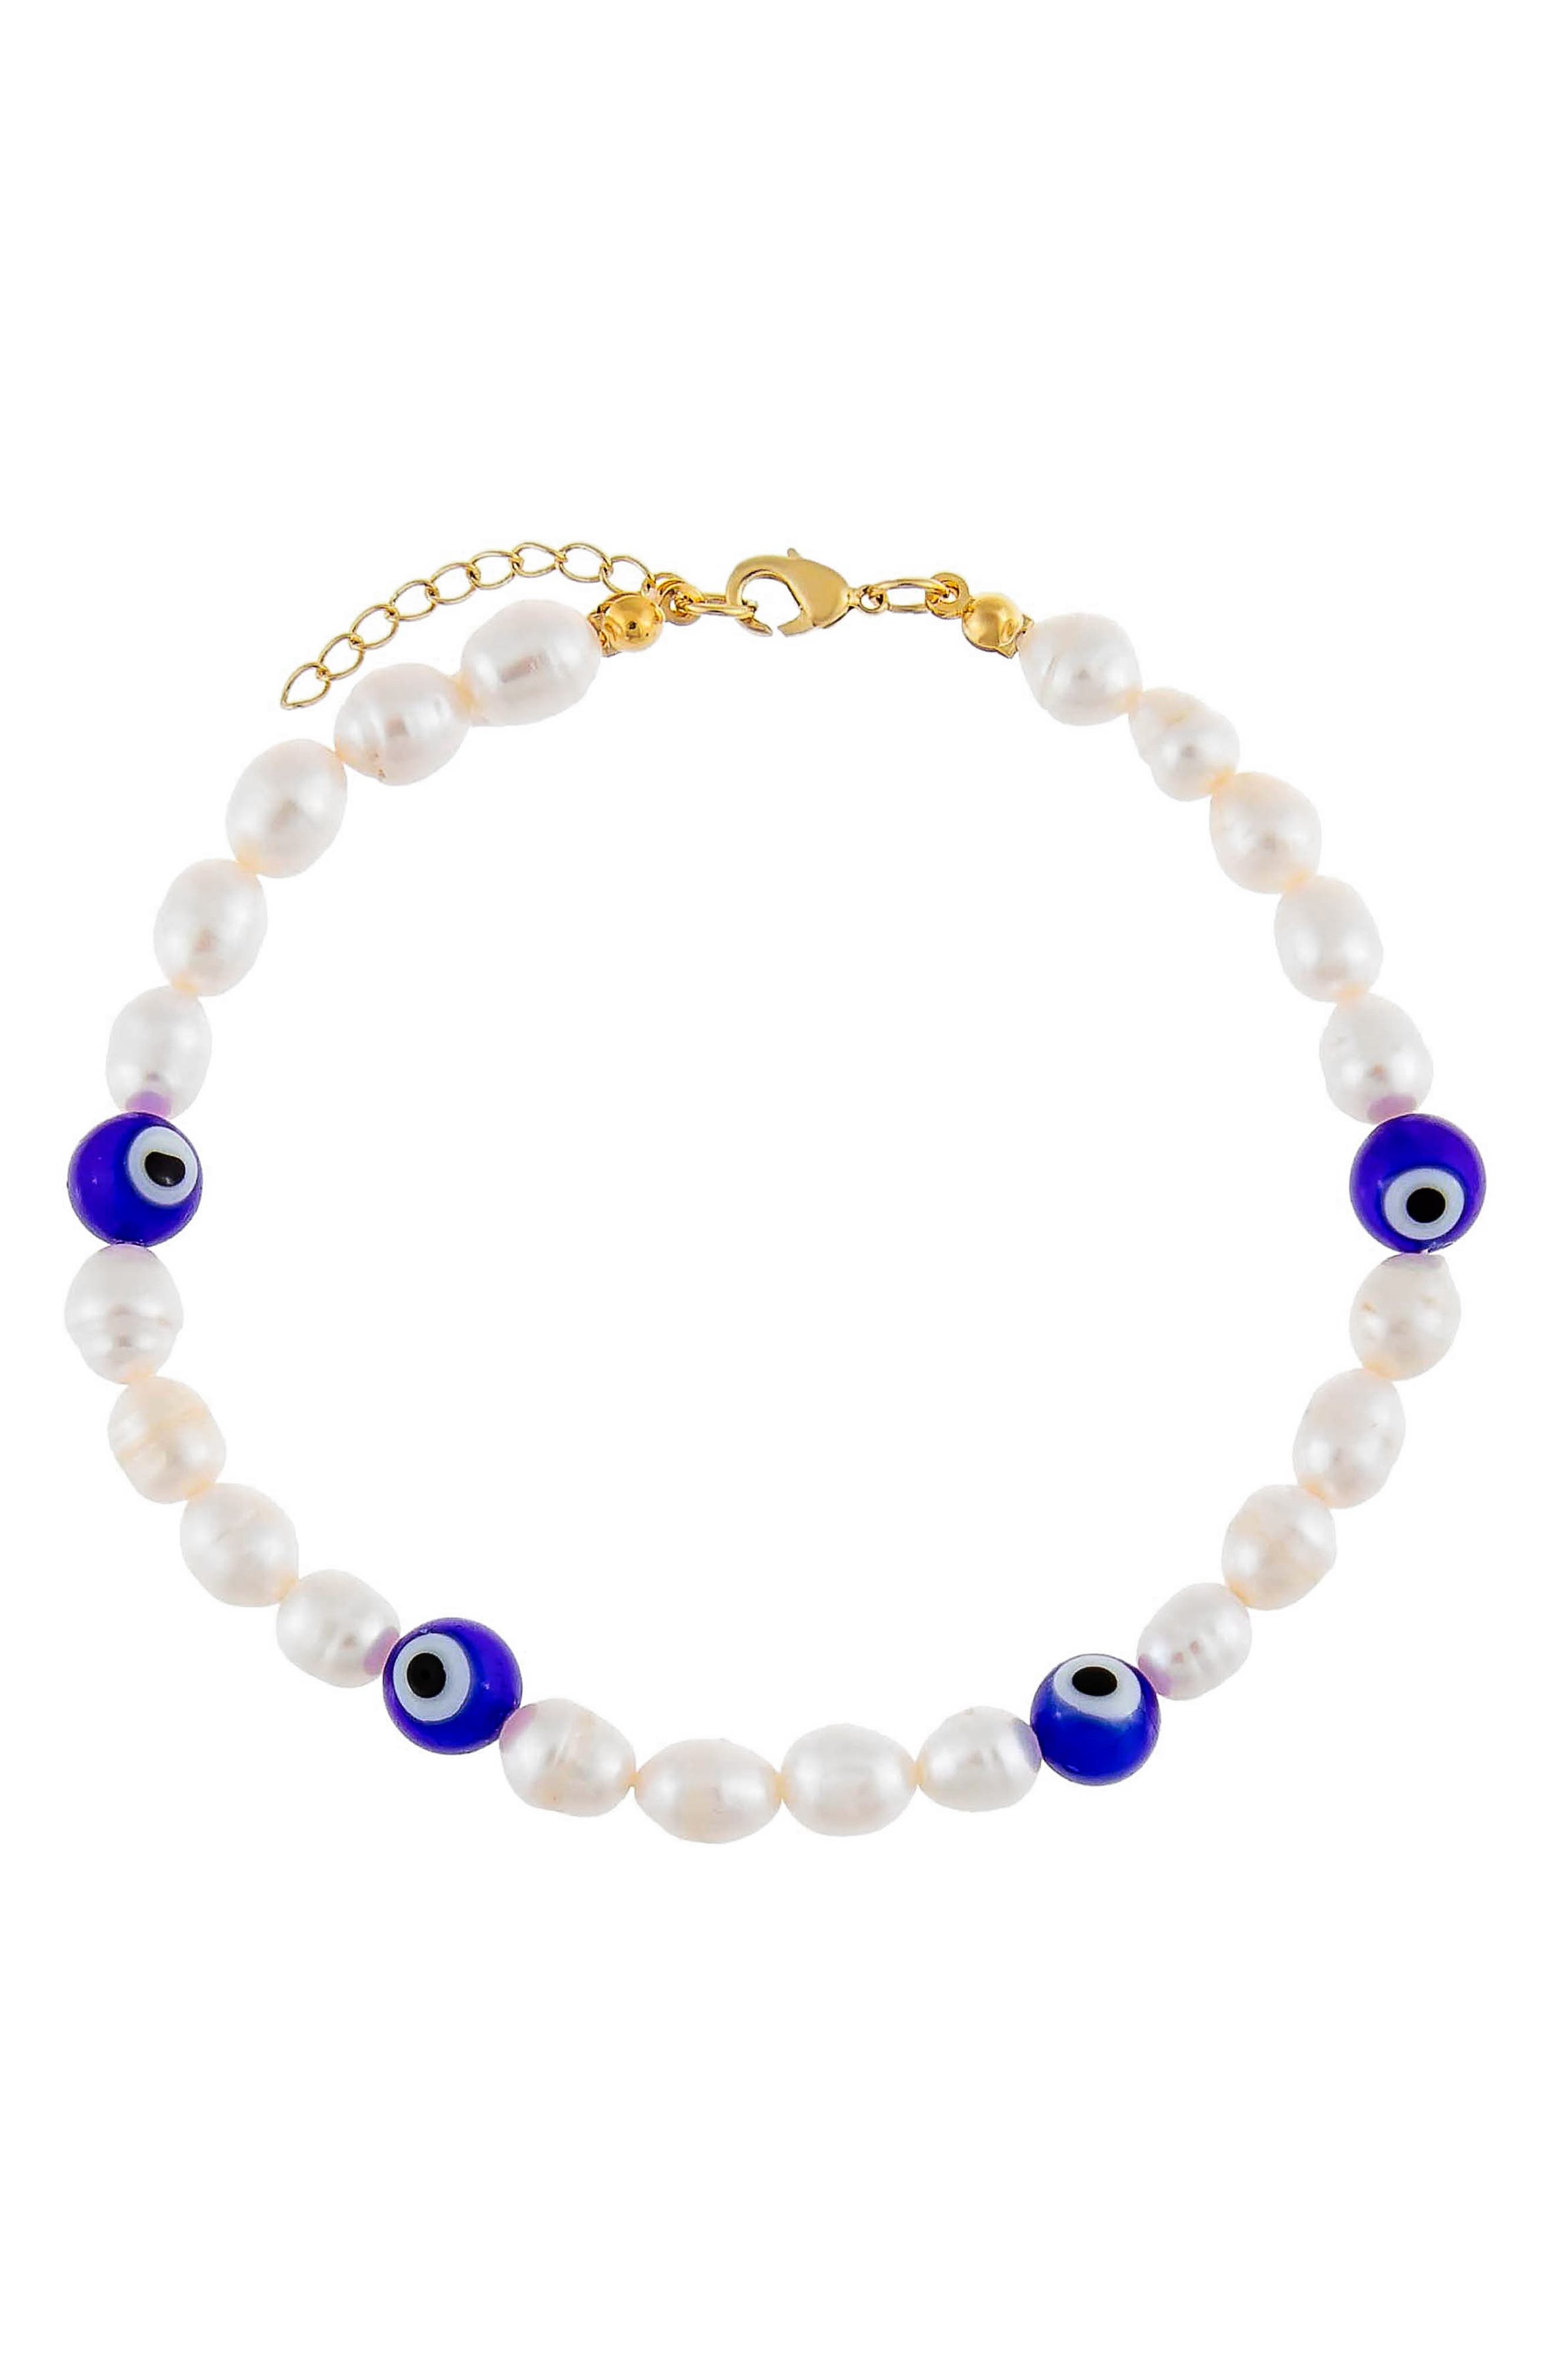 Women's Adina's Jewels Freshwater Pearl Evil Eye Station Anklet